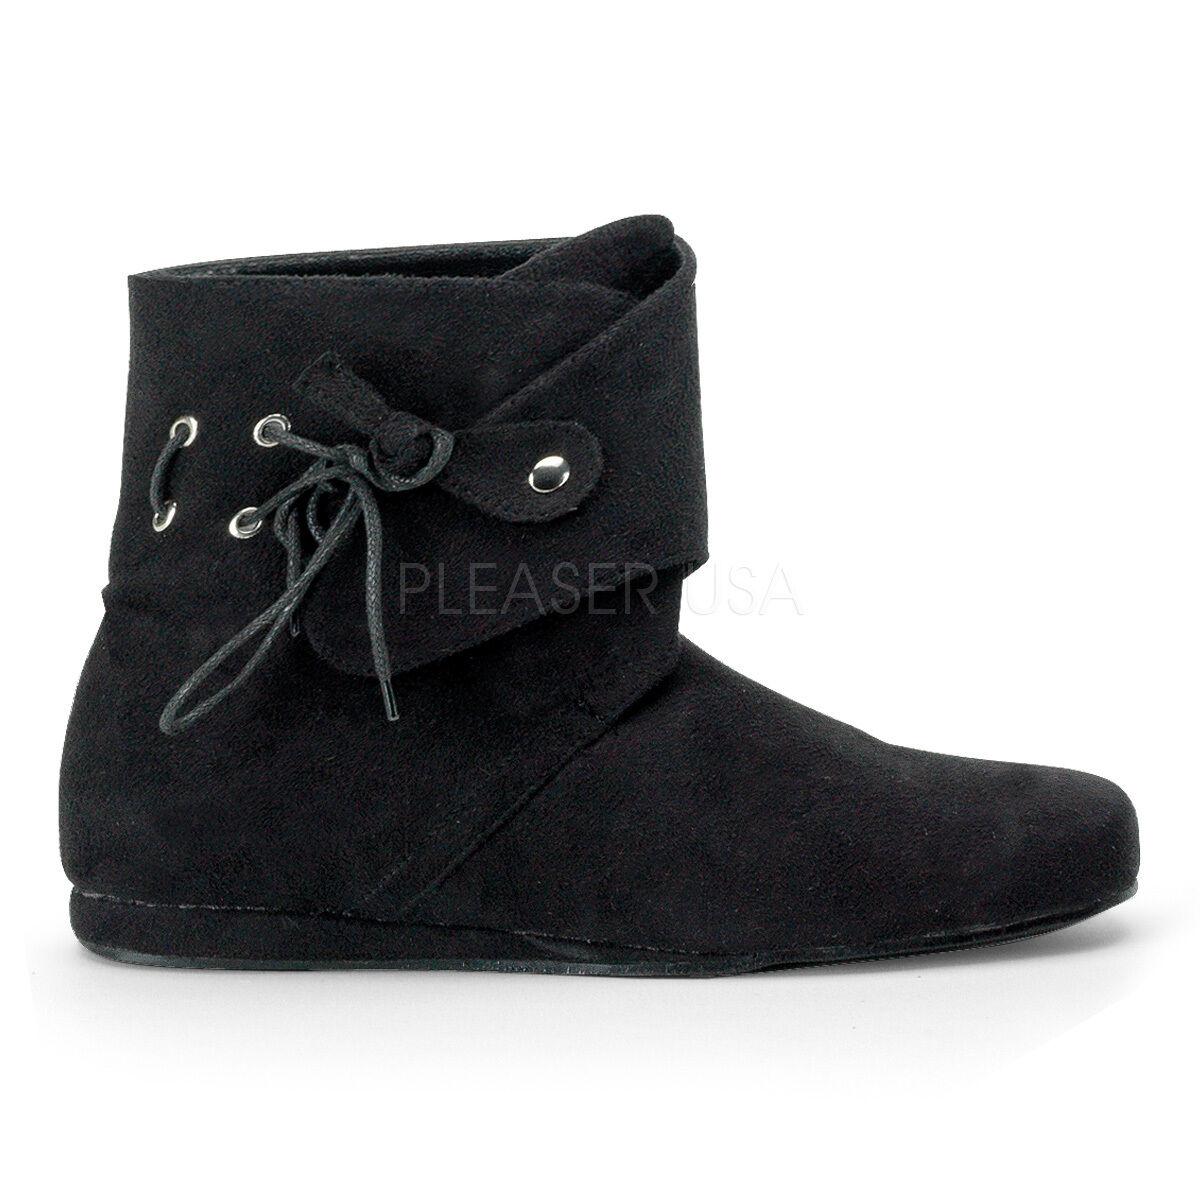 Mens Black Scottish Highland Groomsmen Wedding Medieval Costume Boots Shoes 8 9